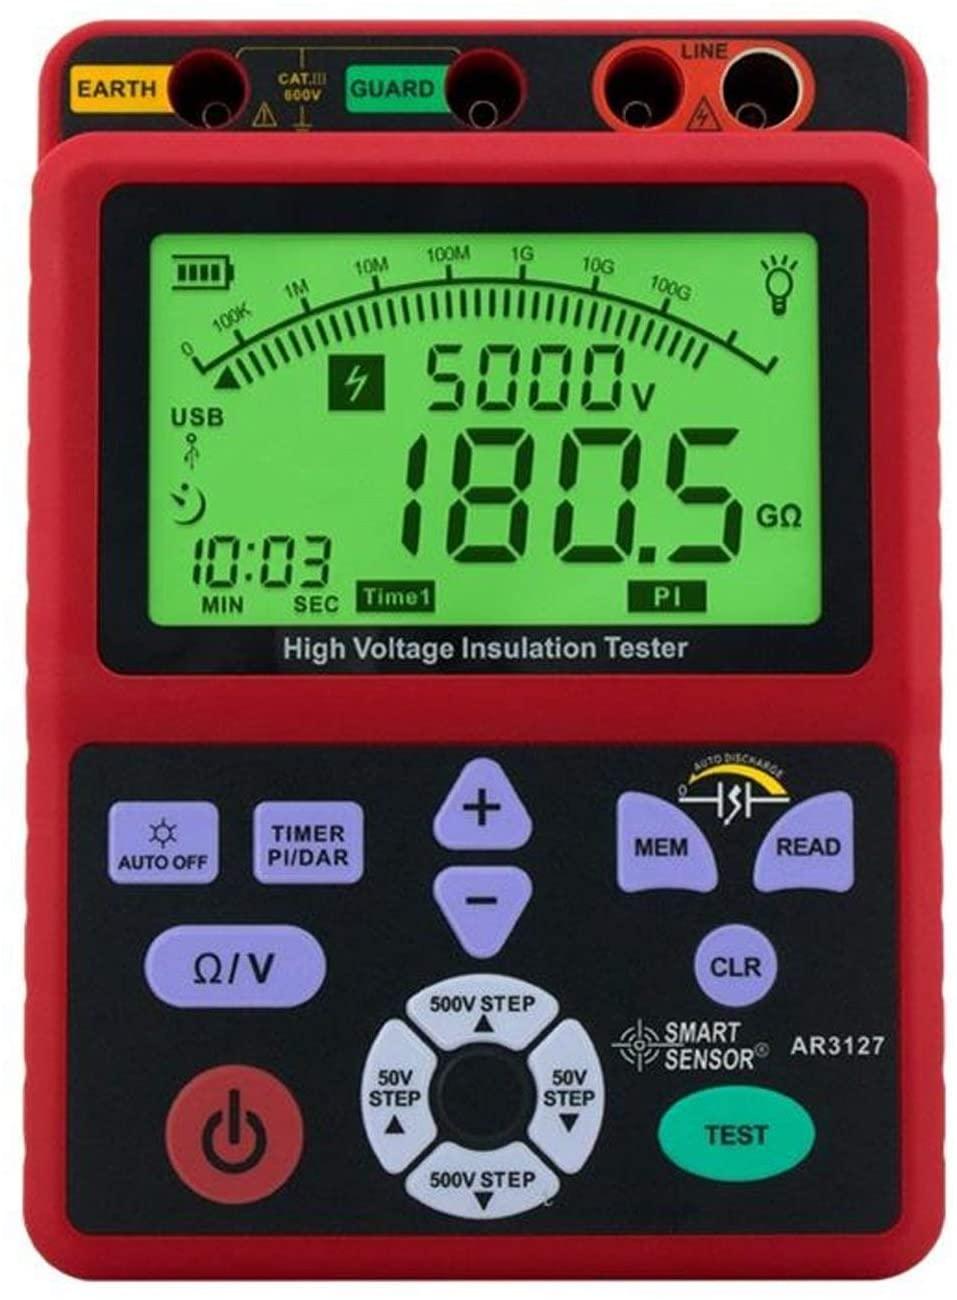 SXM-SXM Digital high voltage insulation resistance tester 5000V shake table electronic table 0.0-99.9G ohm resistor AR3127 Multimeter Tester